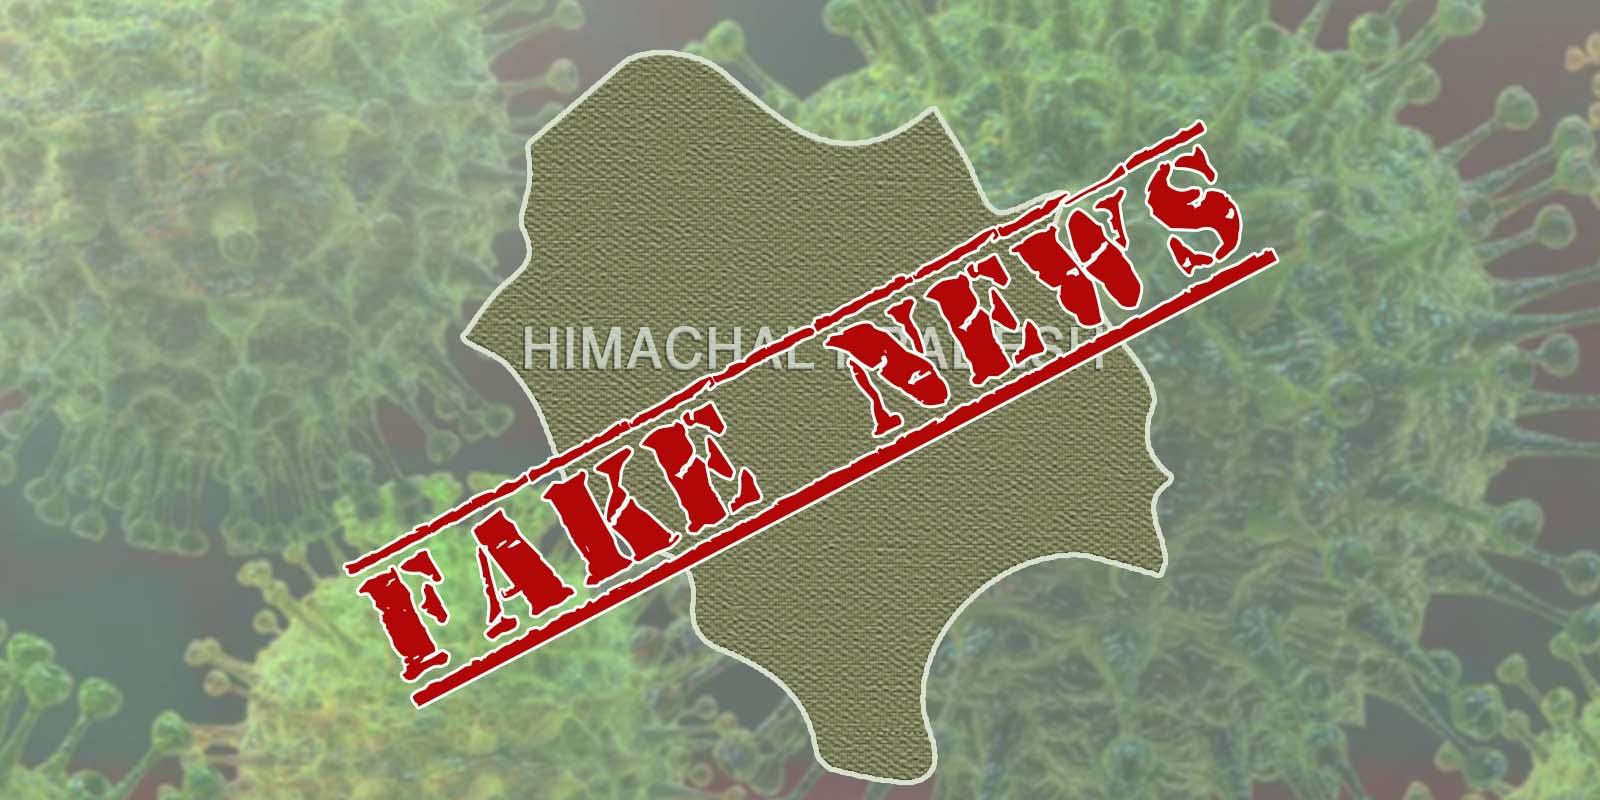 fake news of curfew in himachal pradesh